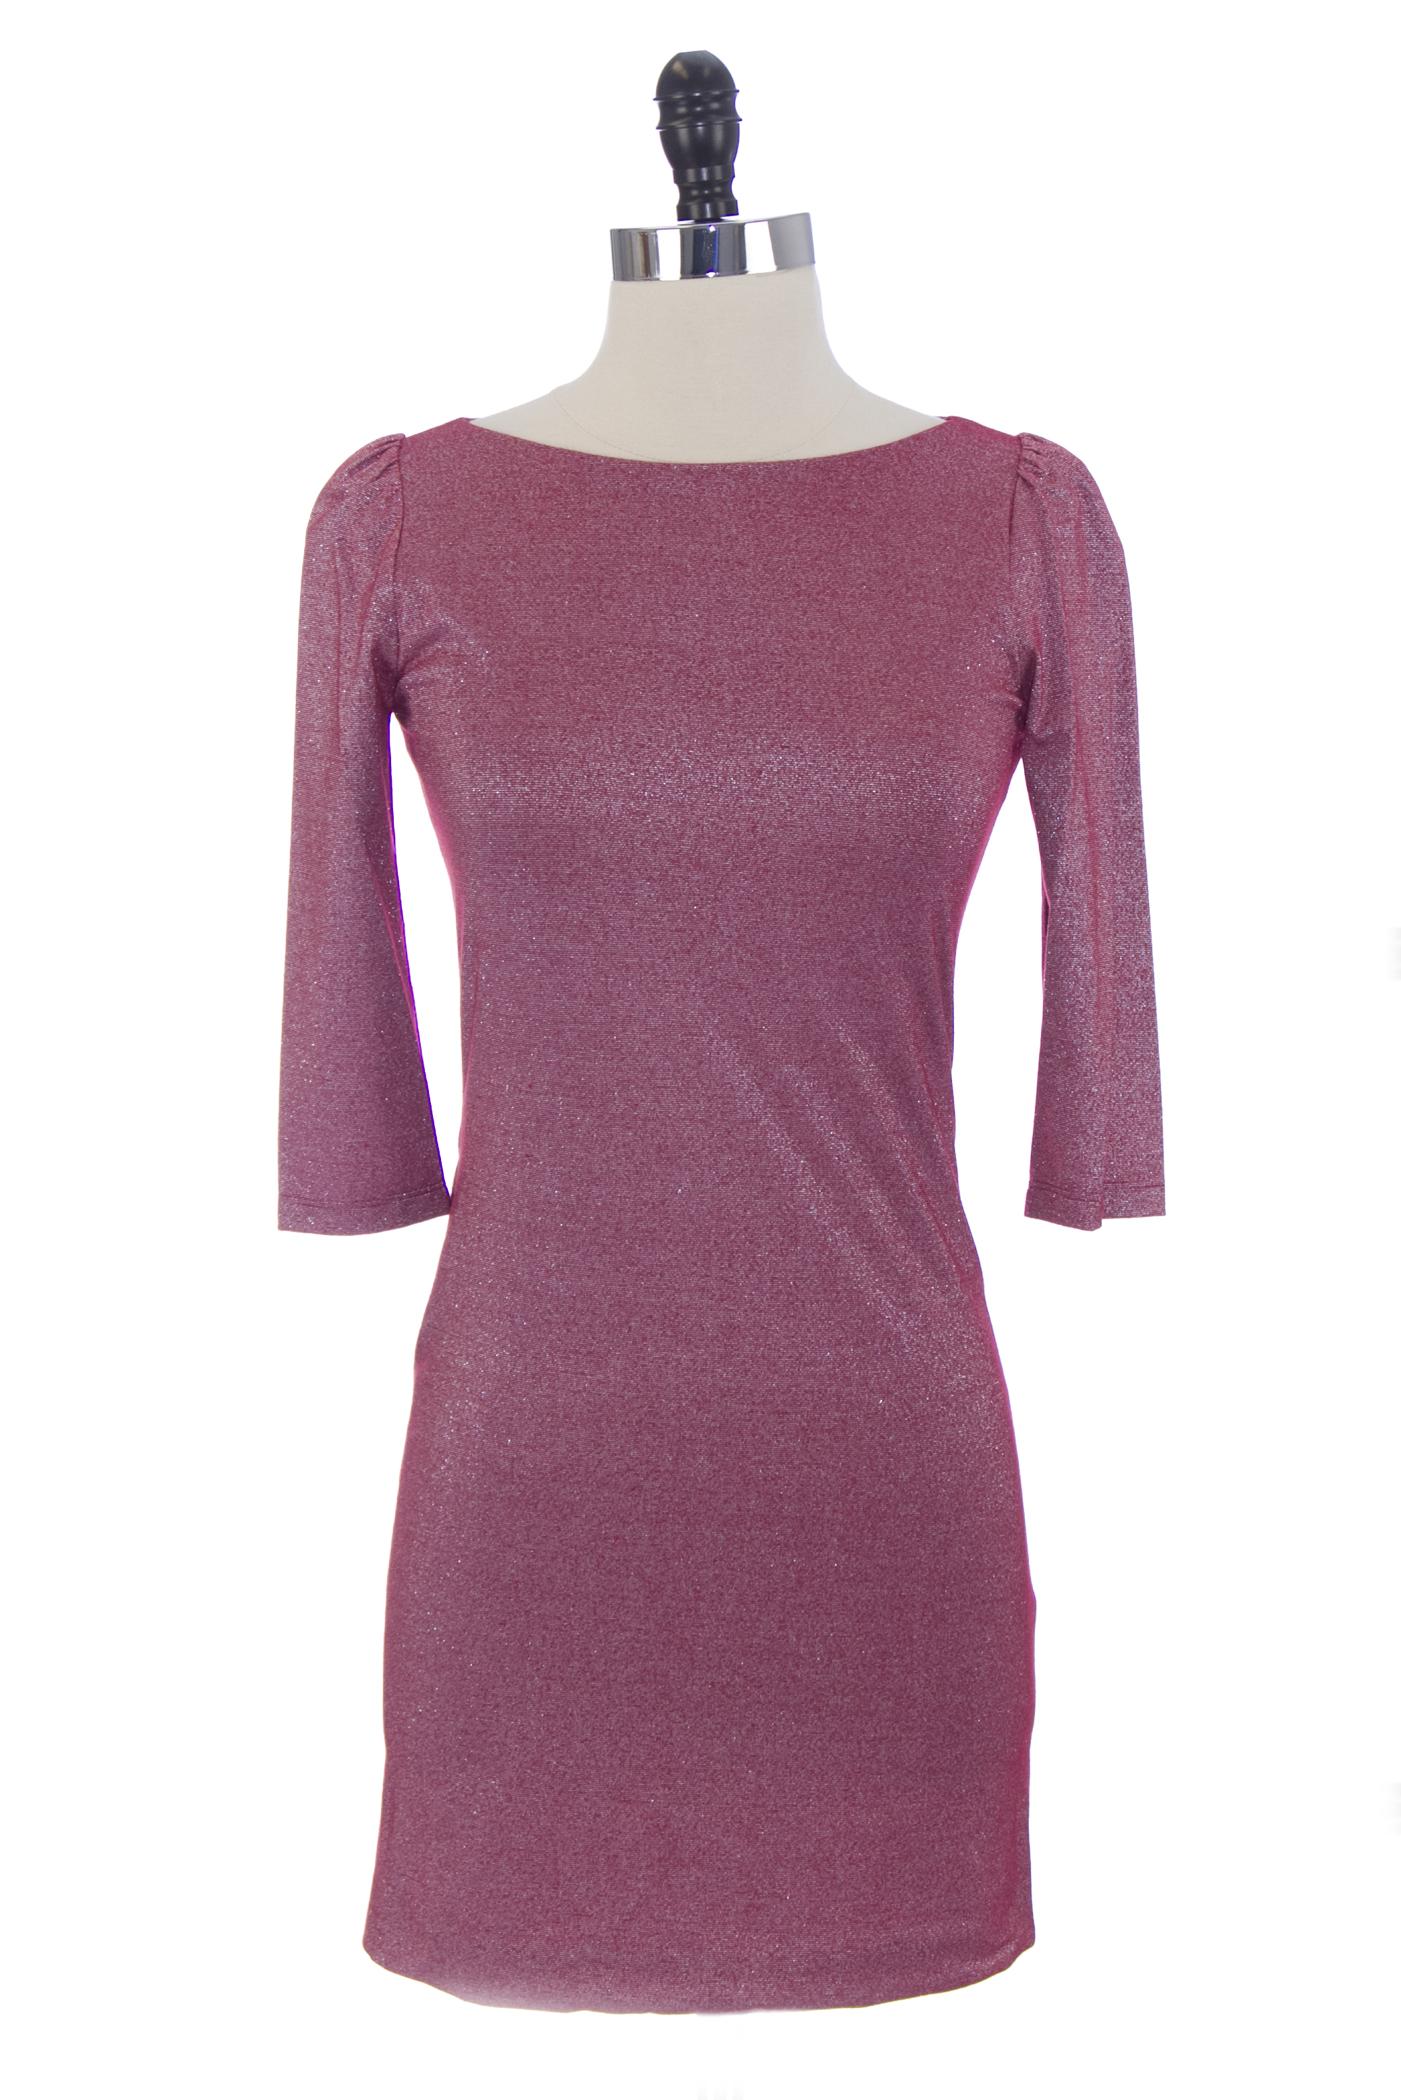 166e30be598 VON VONNI Women s Tropic Red London Elbow Sleeve Dress  170 NEW